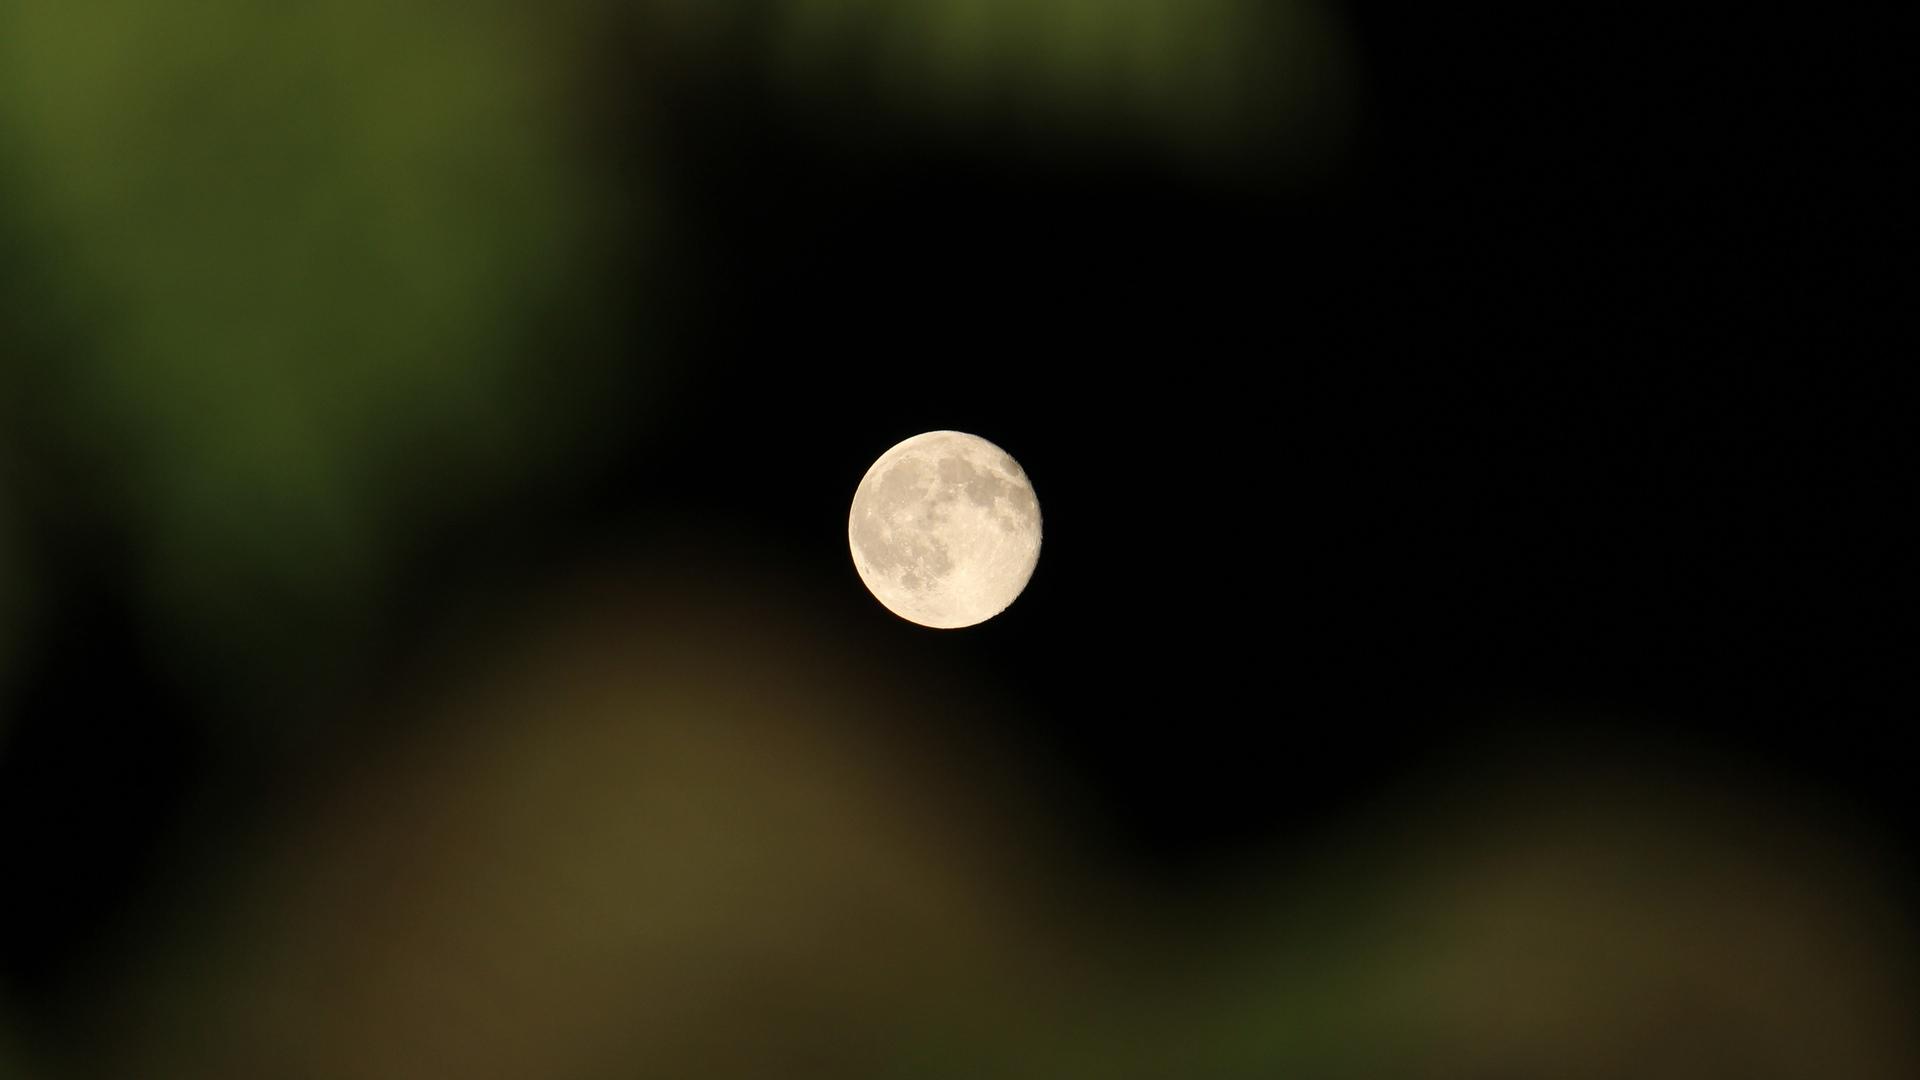 Full Moon June 13-14 2014